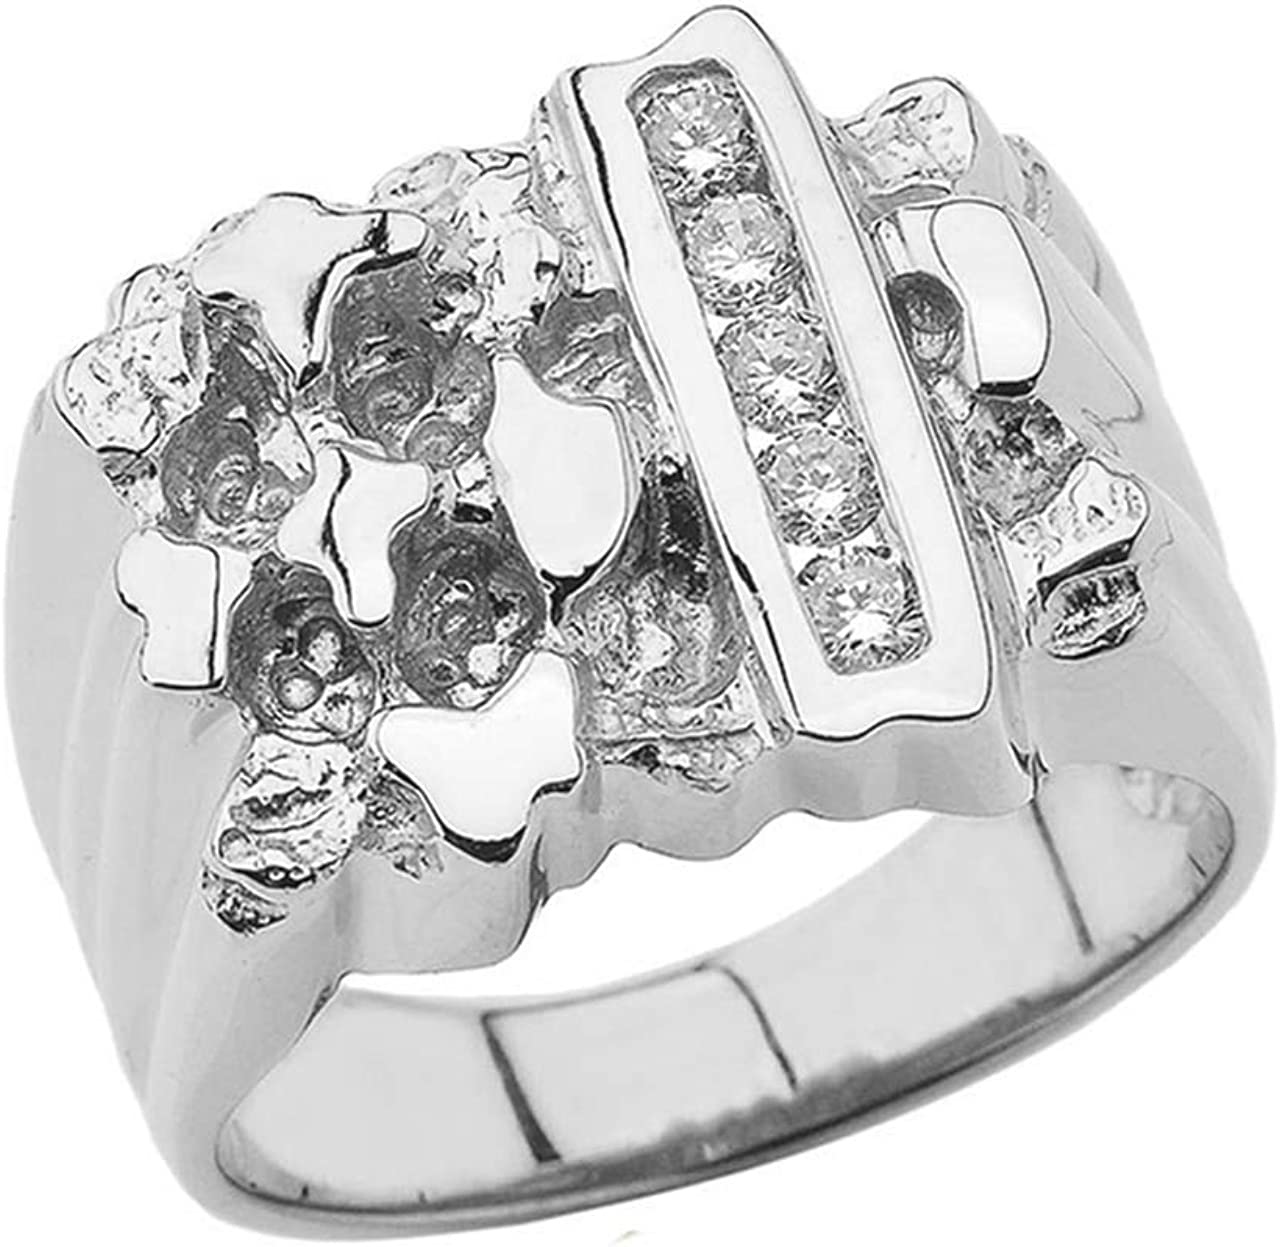 Mens Sterling Silver Rectangular Nugget Ring